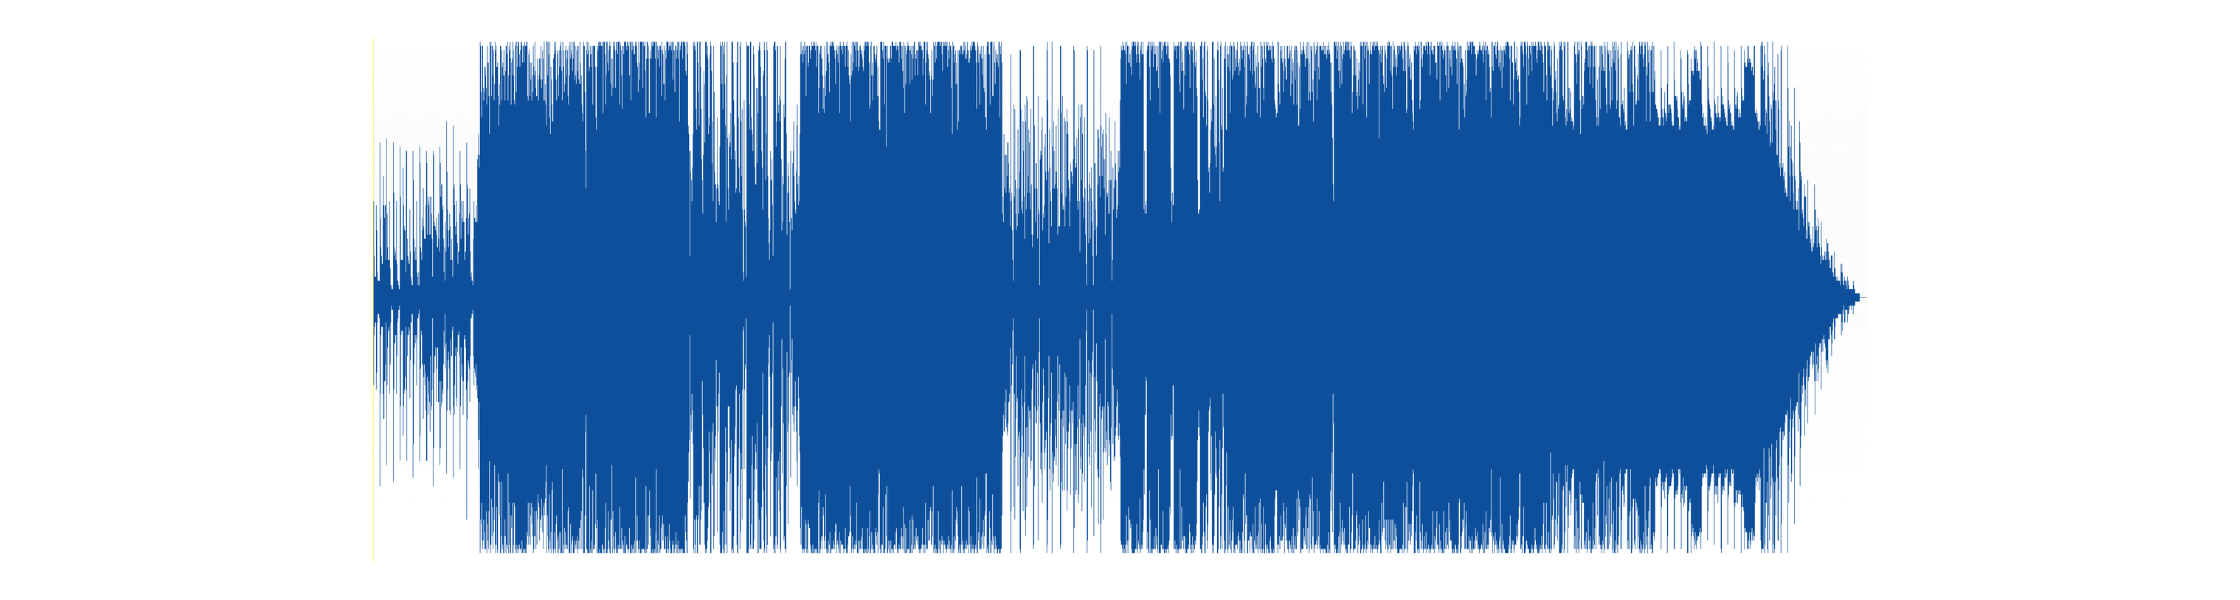 STAKING NFT Music Soundwave_Connie Digital_MAiWORLD